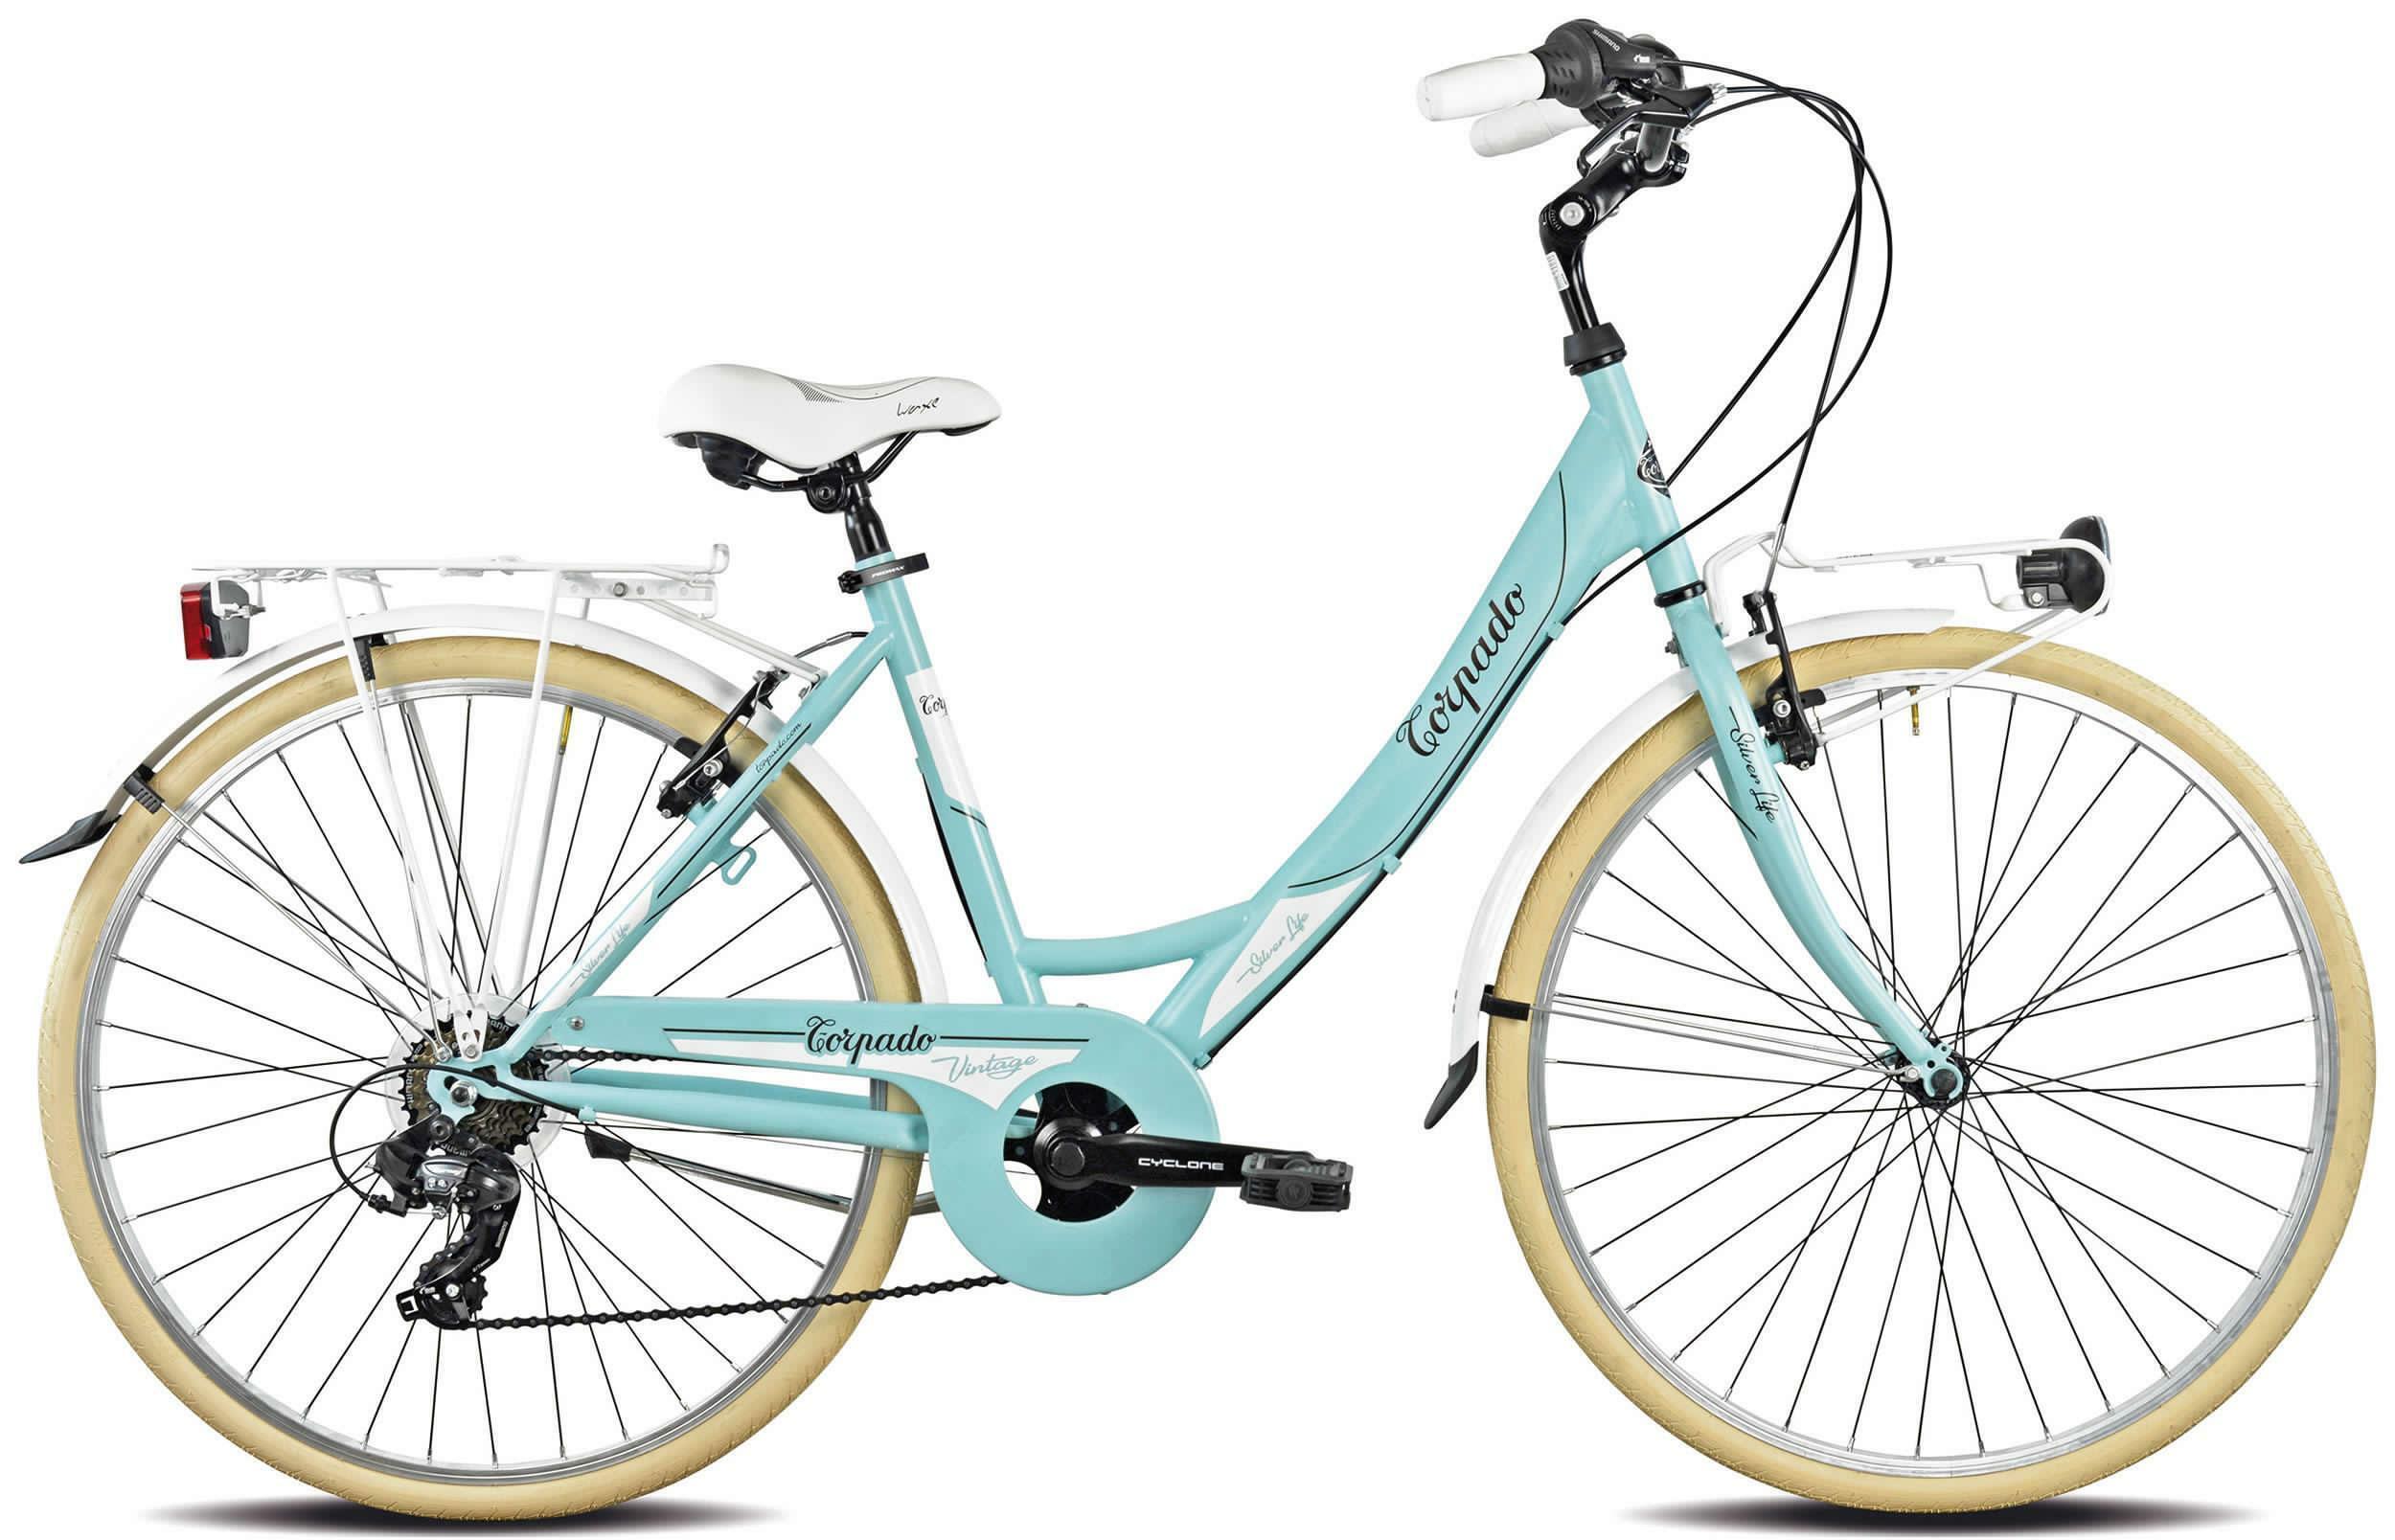 torpado torpado bici passeggio donna silverlife celeste